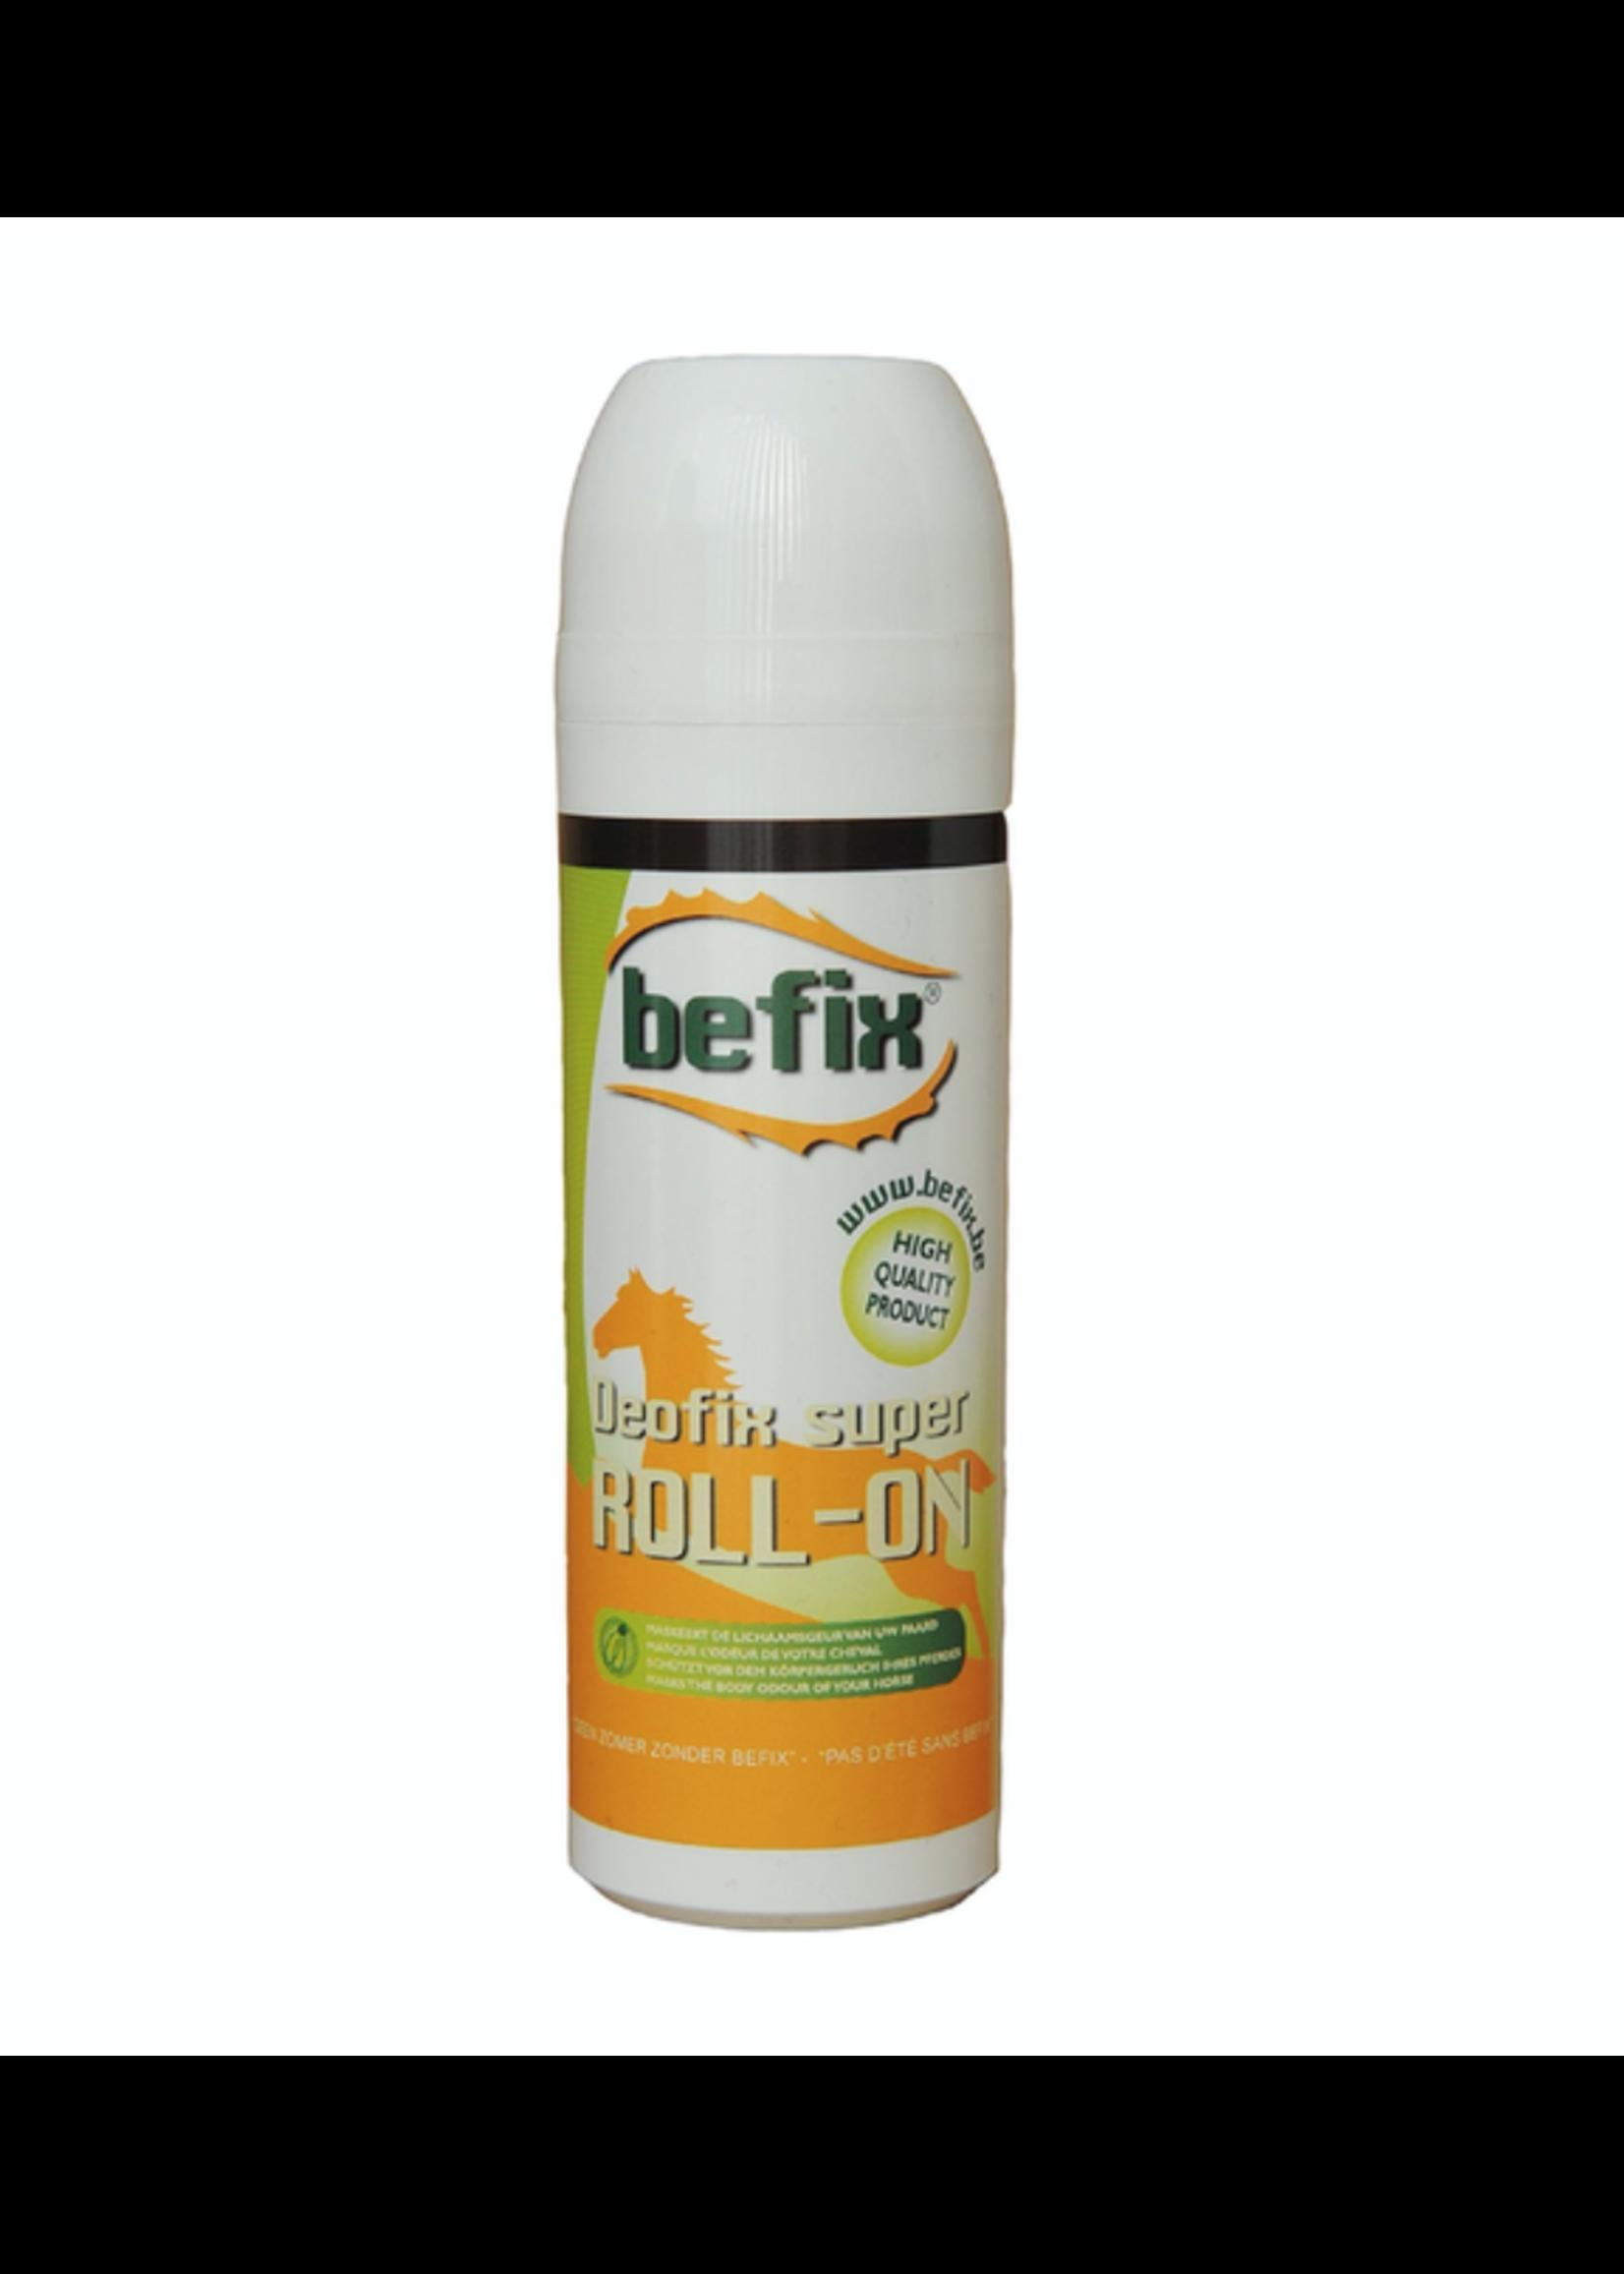 Befix Befix Deofix Super Roll-on